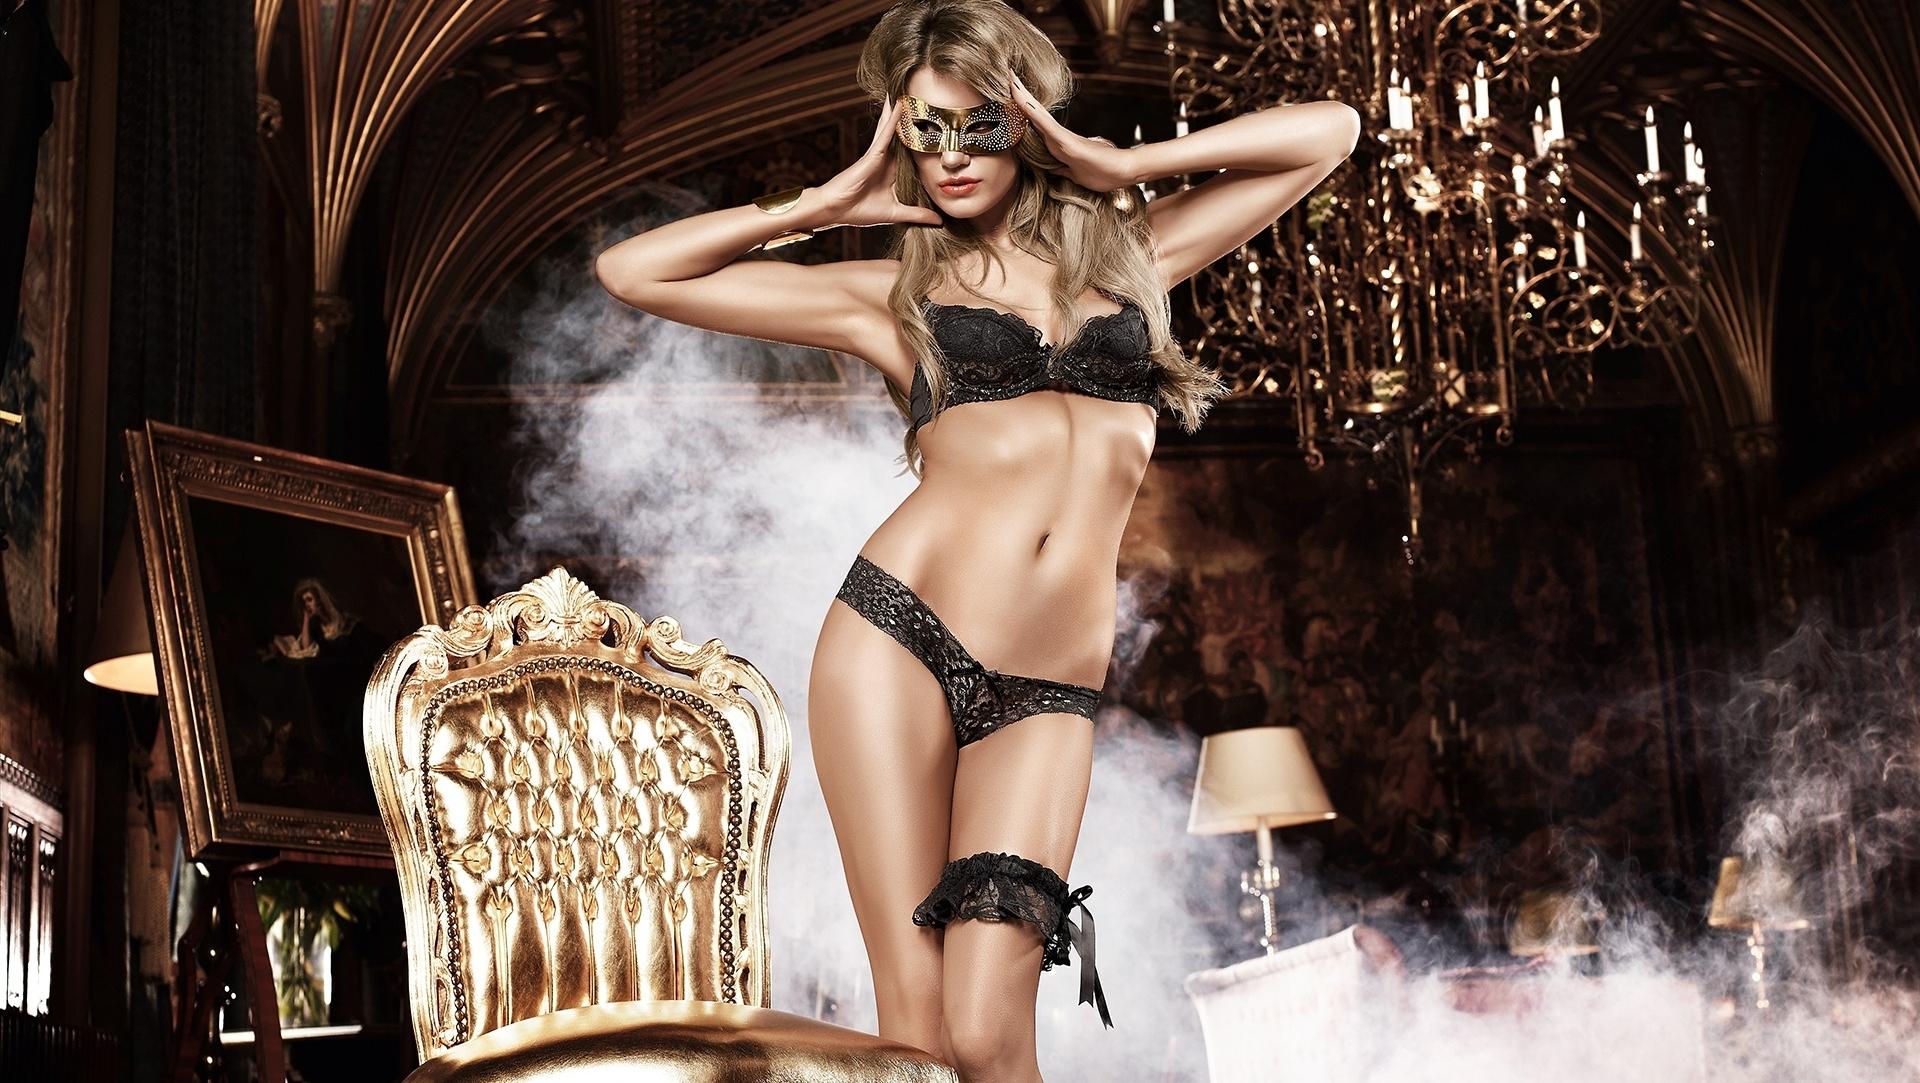 foto-seksualnih-devushek-na-rab-stol